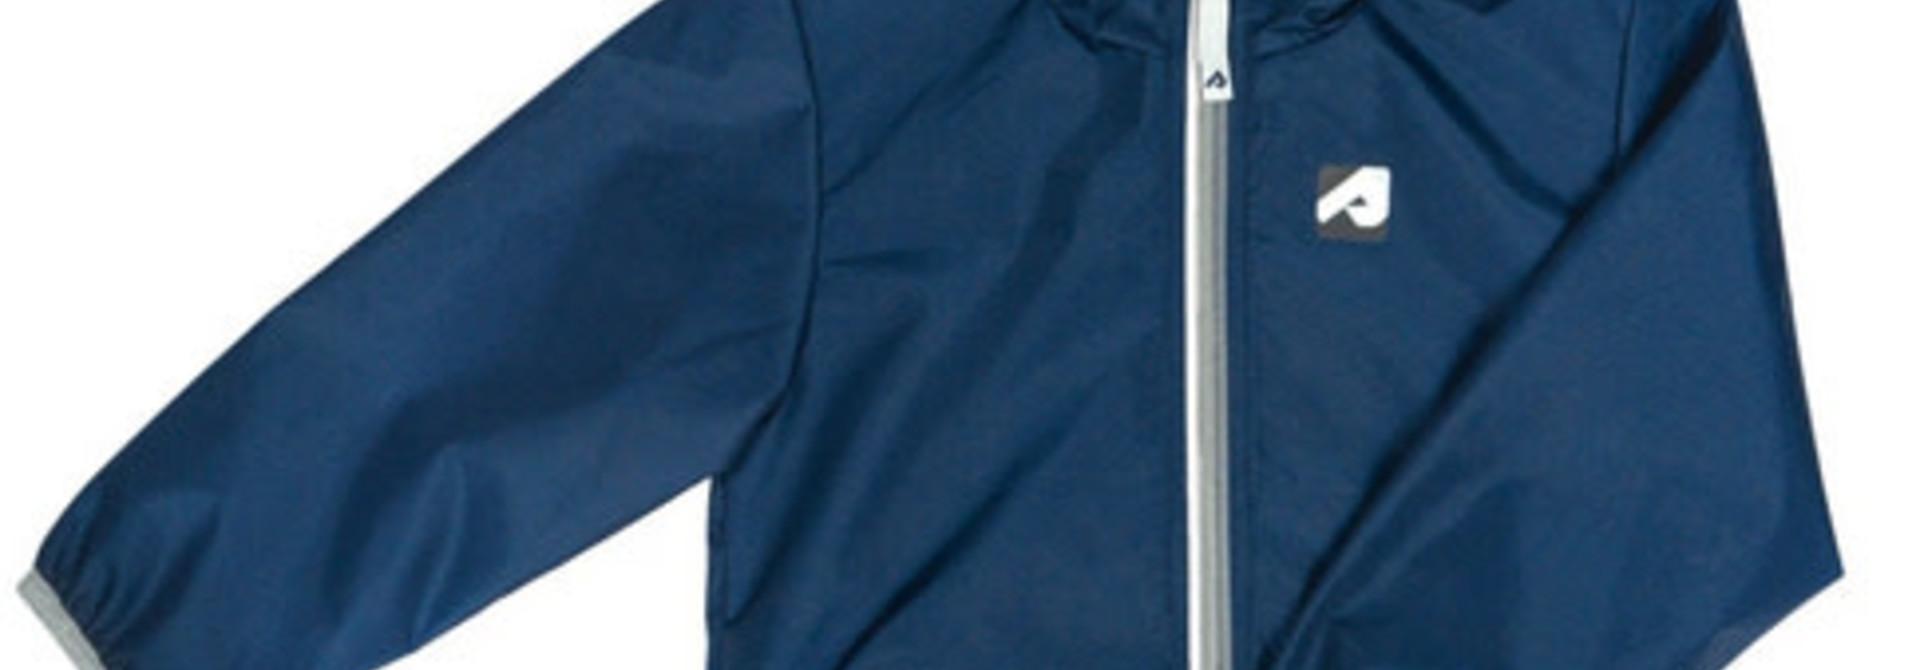 Manteau mi-saison - Marine